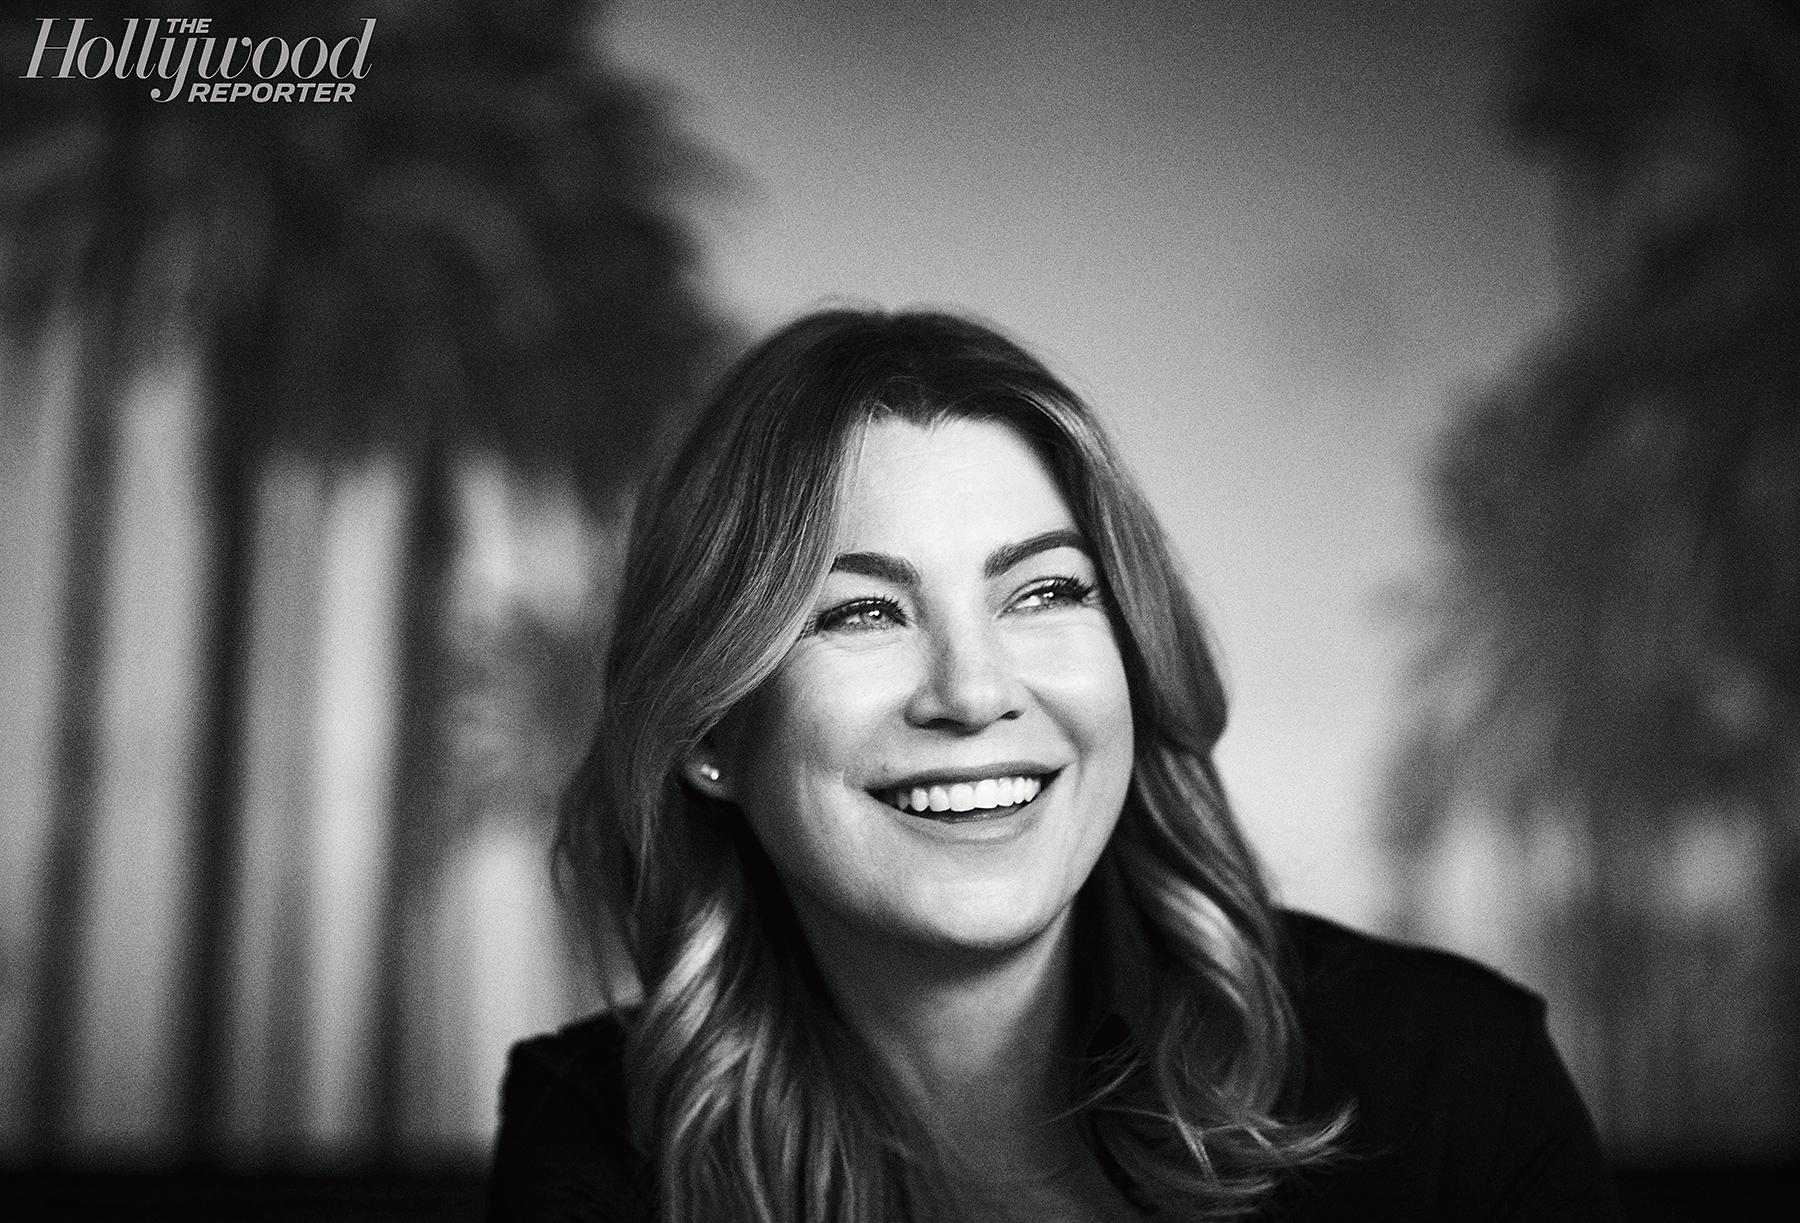 Ellen Pompeo The Hollywood Reporter